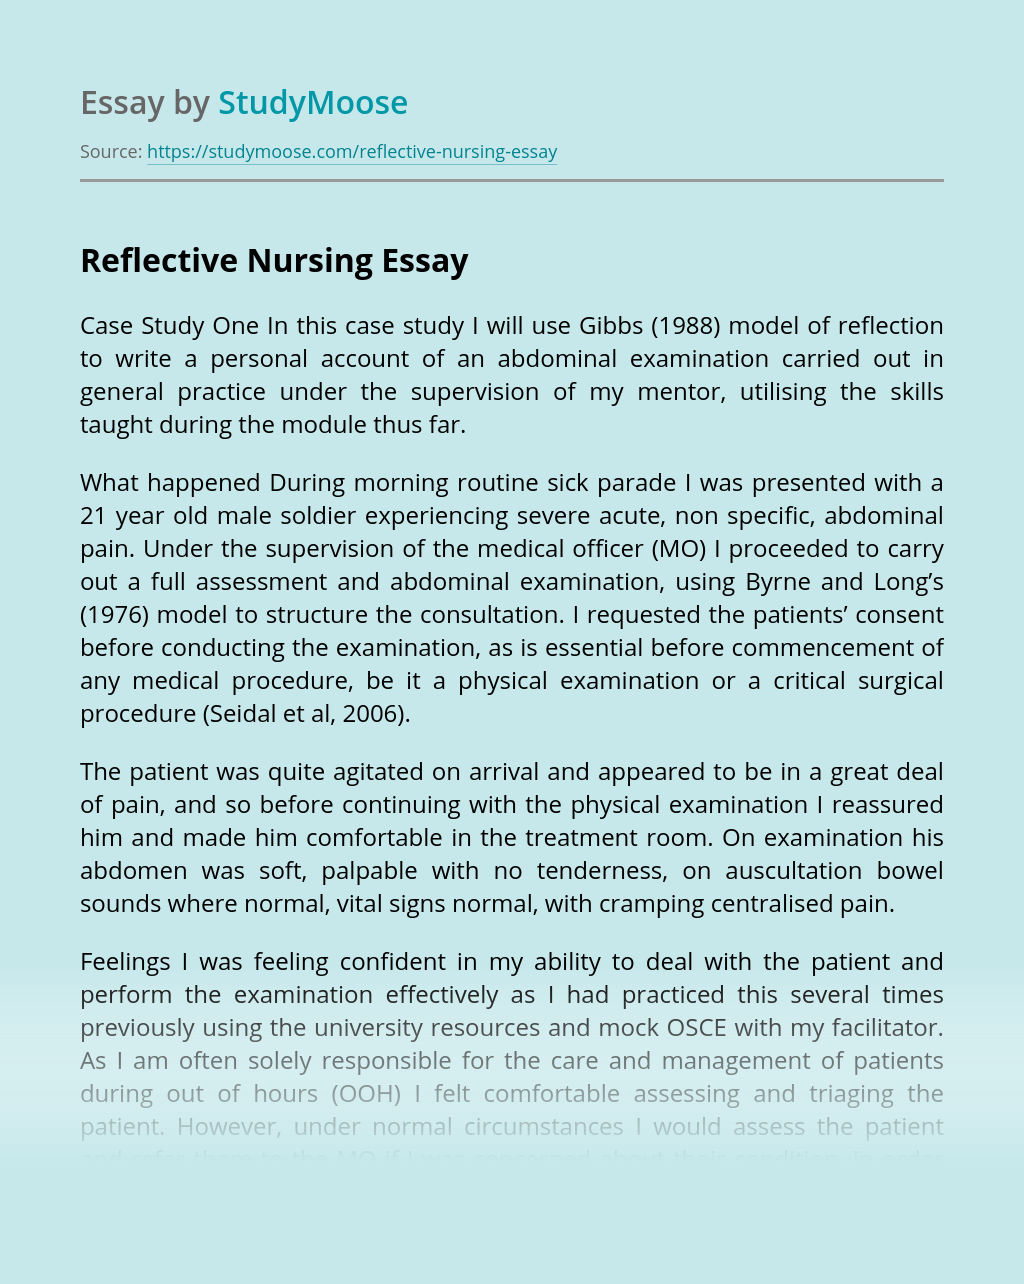 Reflective Nursing